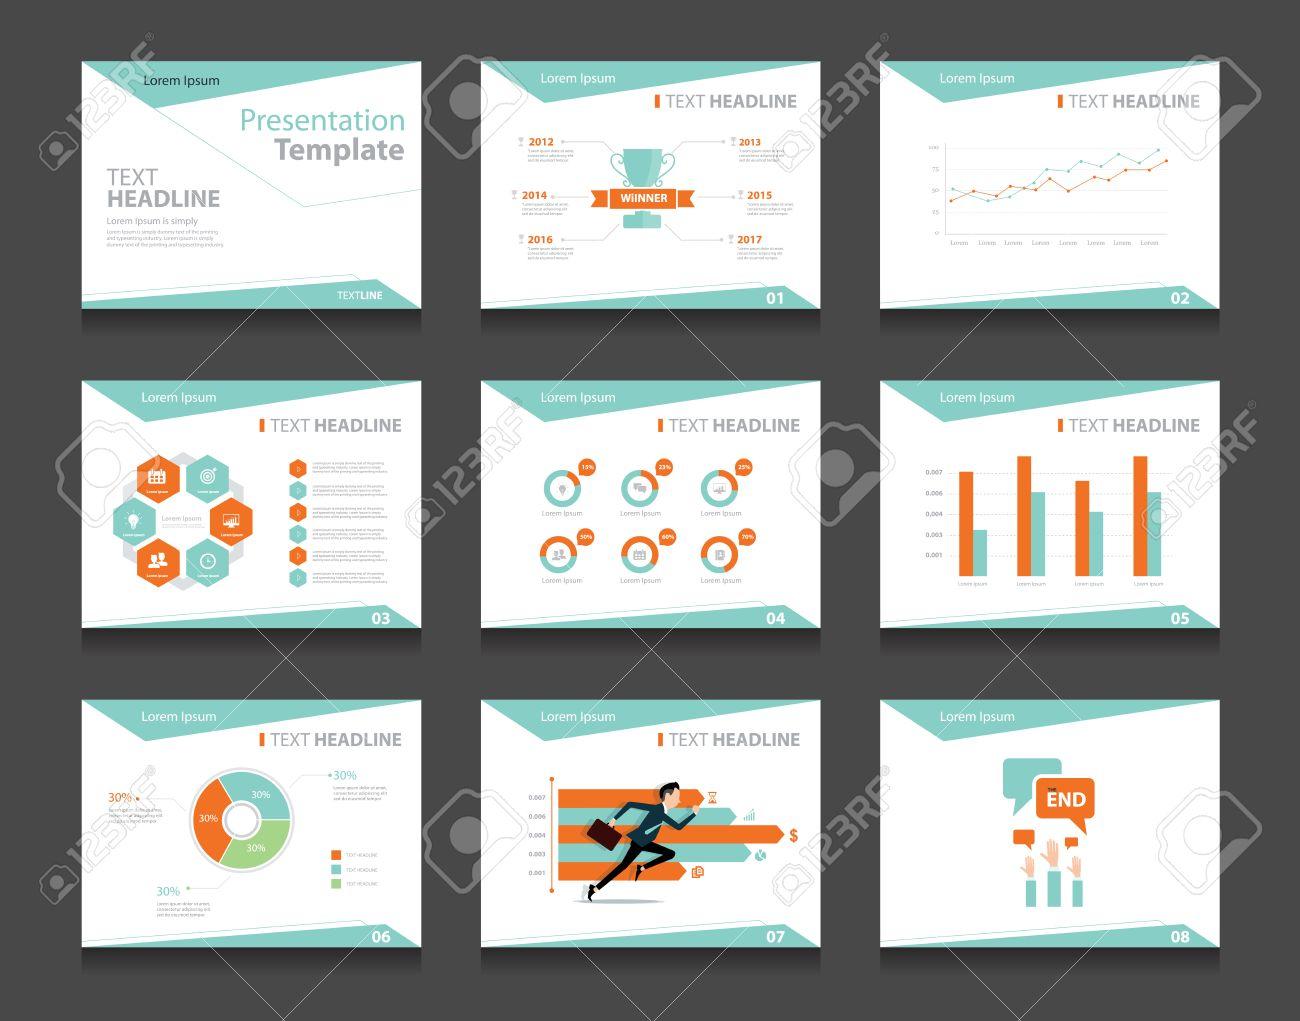 Infographic business presentation template setpowerpoint template infographic business presentation template setpowerpoint template design backgrounds stock vector 43683108 toneelgroepblik Images